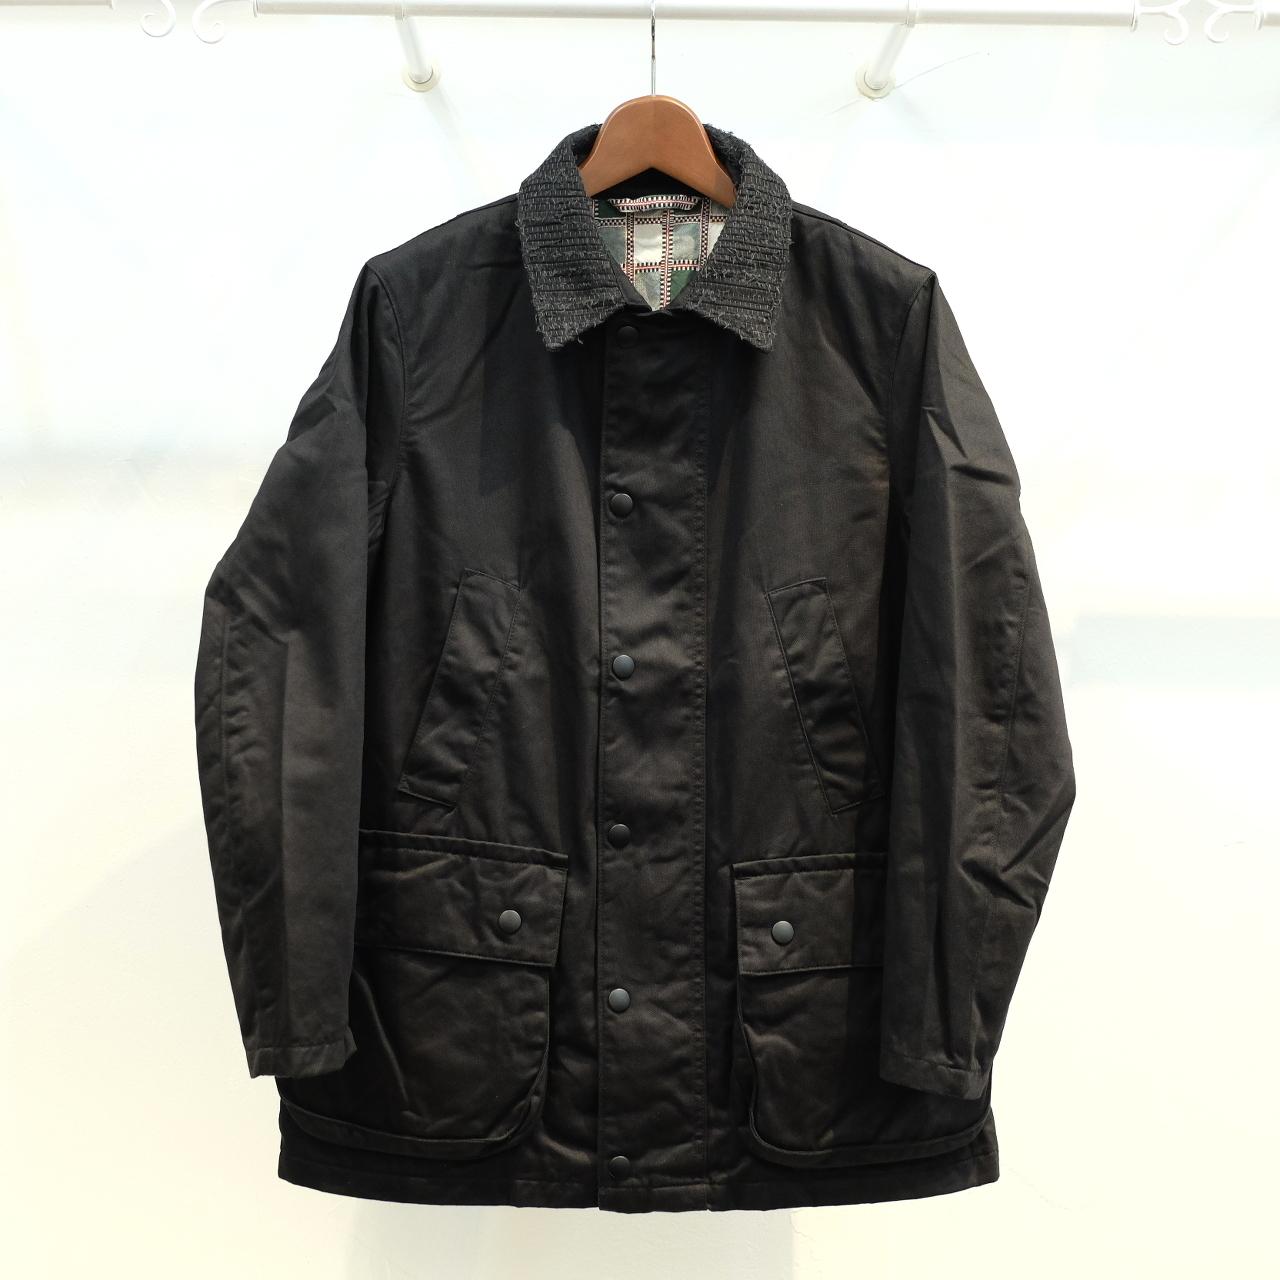 KUON(クオン) 襟裂織りフィールドジャケット(裏吉野格子) ブラックチノ